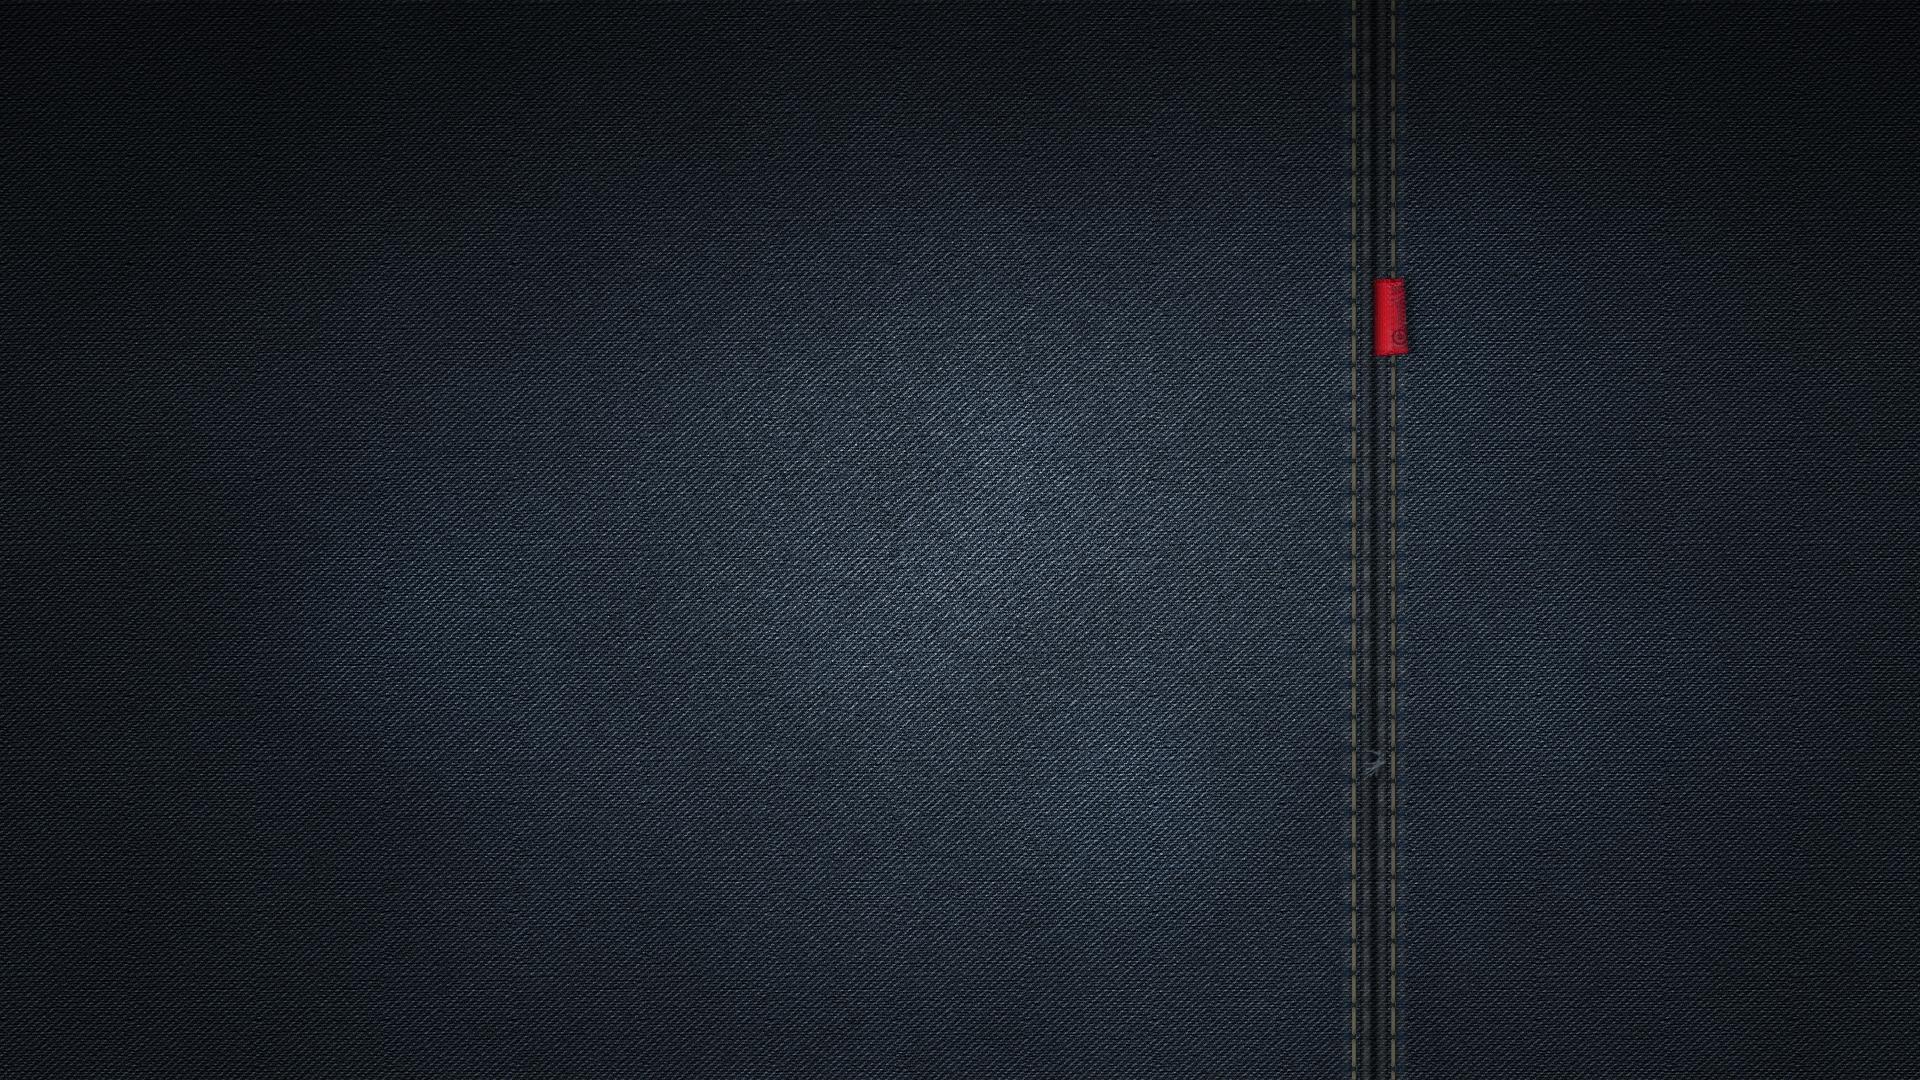 Name Live Wallpaper 3d Leather Wallpaper 22549 1920x1080 Px Hdwallsource Com